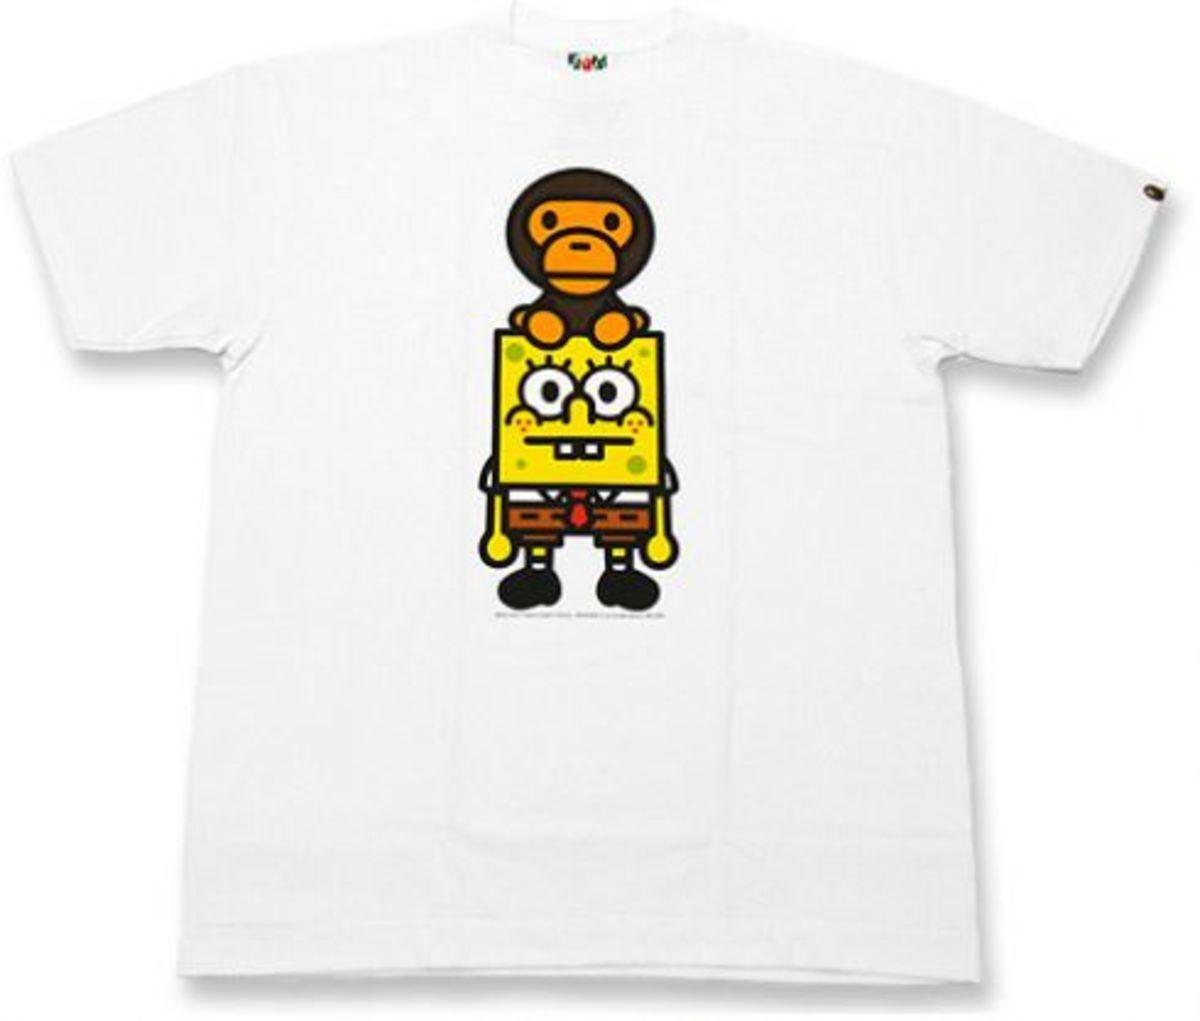 aa03fad5 BAPE x SpongeBob - New Baby Milo T-Shirt | Ideas for the house ...